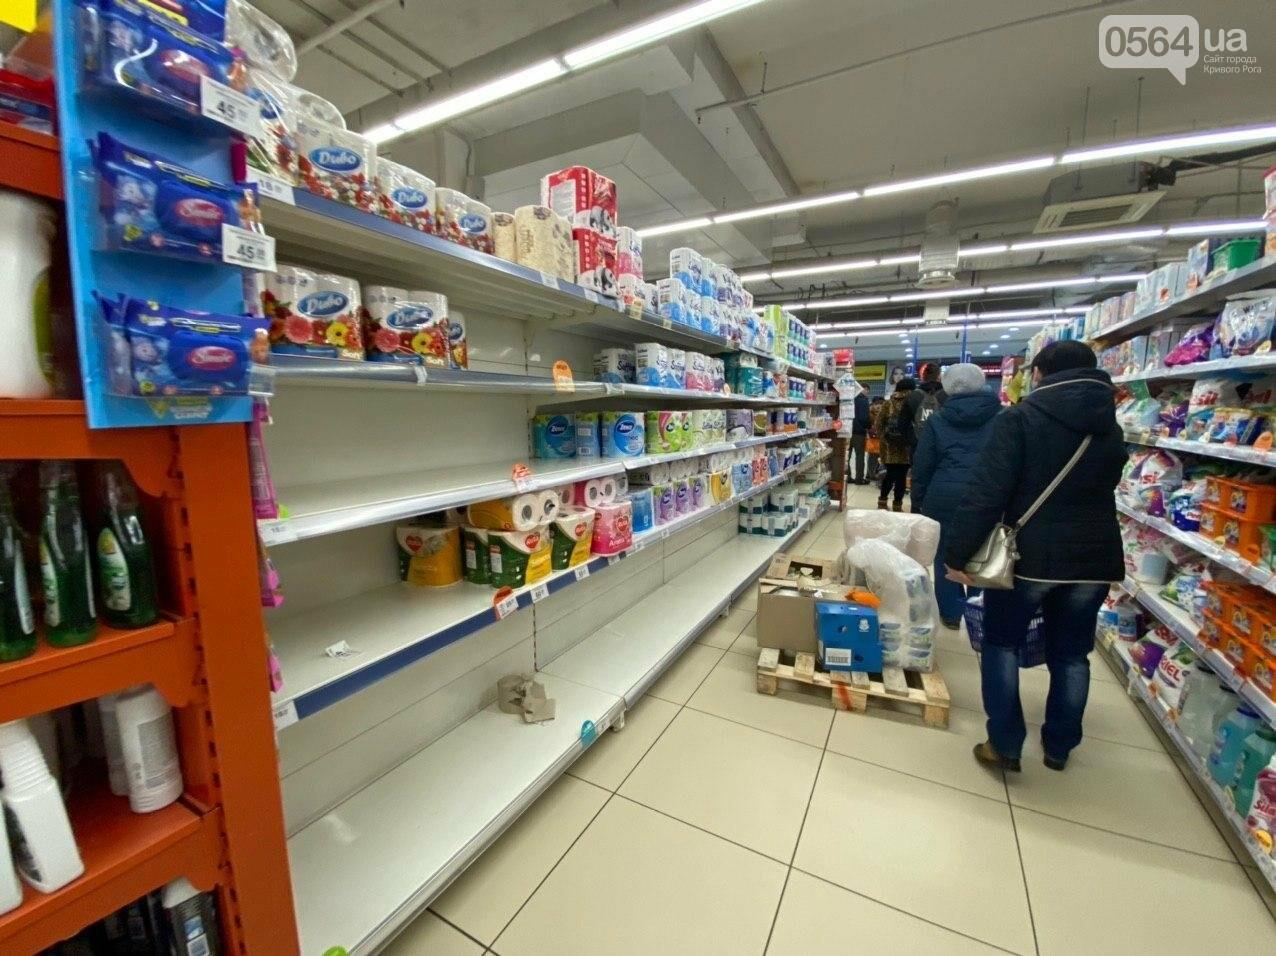 Туалетная бумага и гречка: что скупают криворожане во время карантина, - ФОТО , фото-16